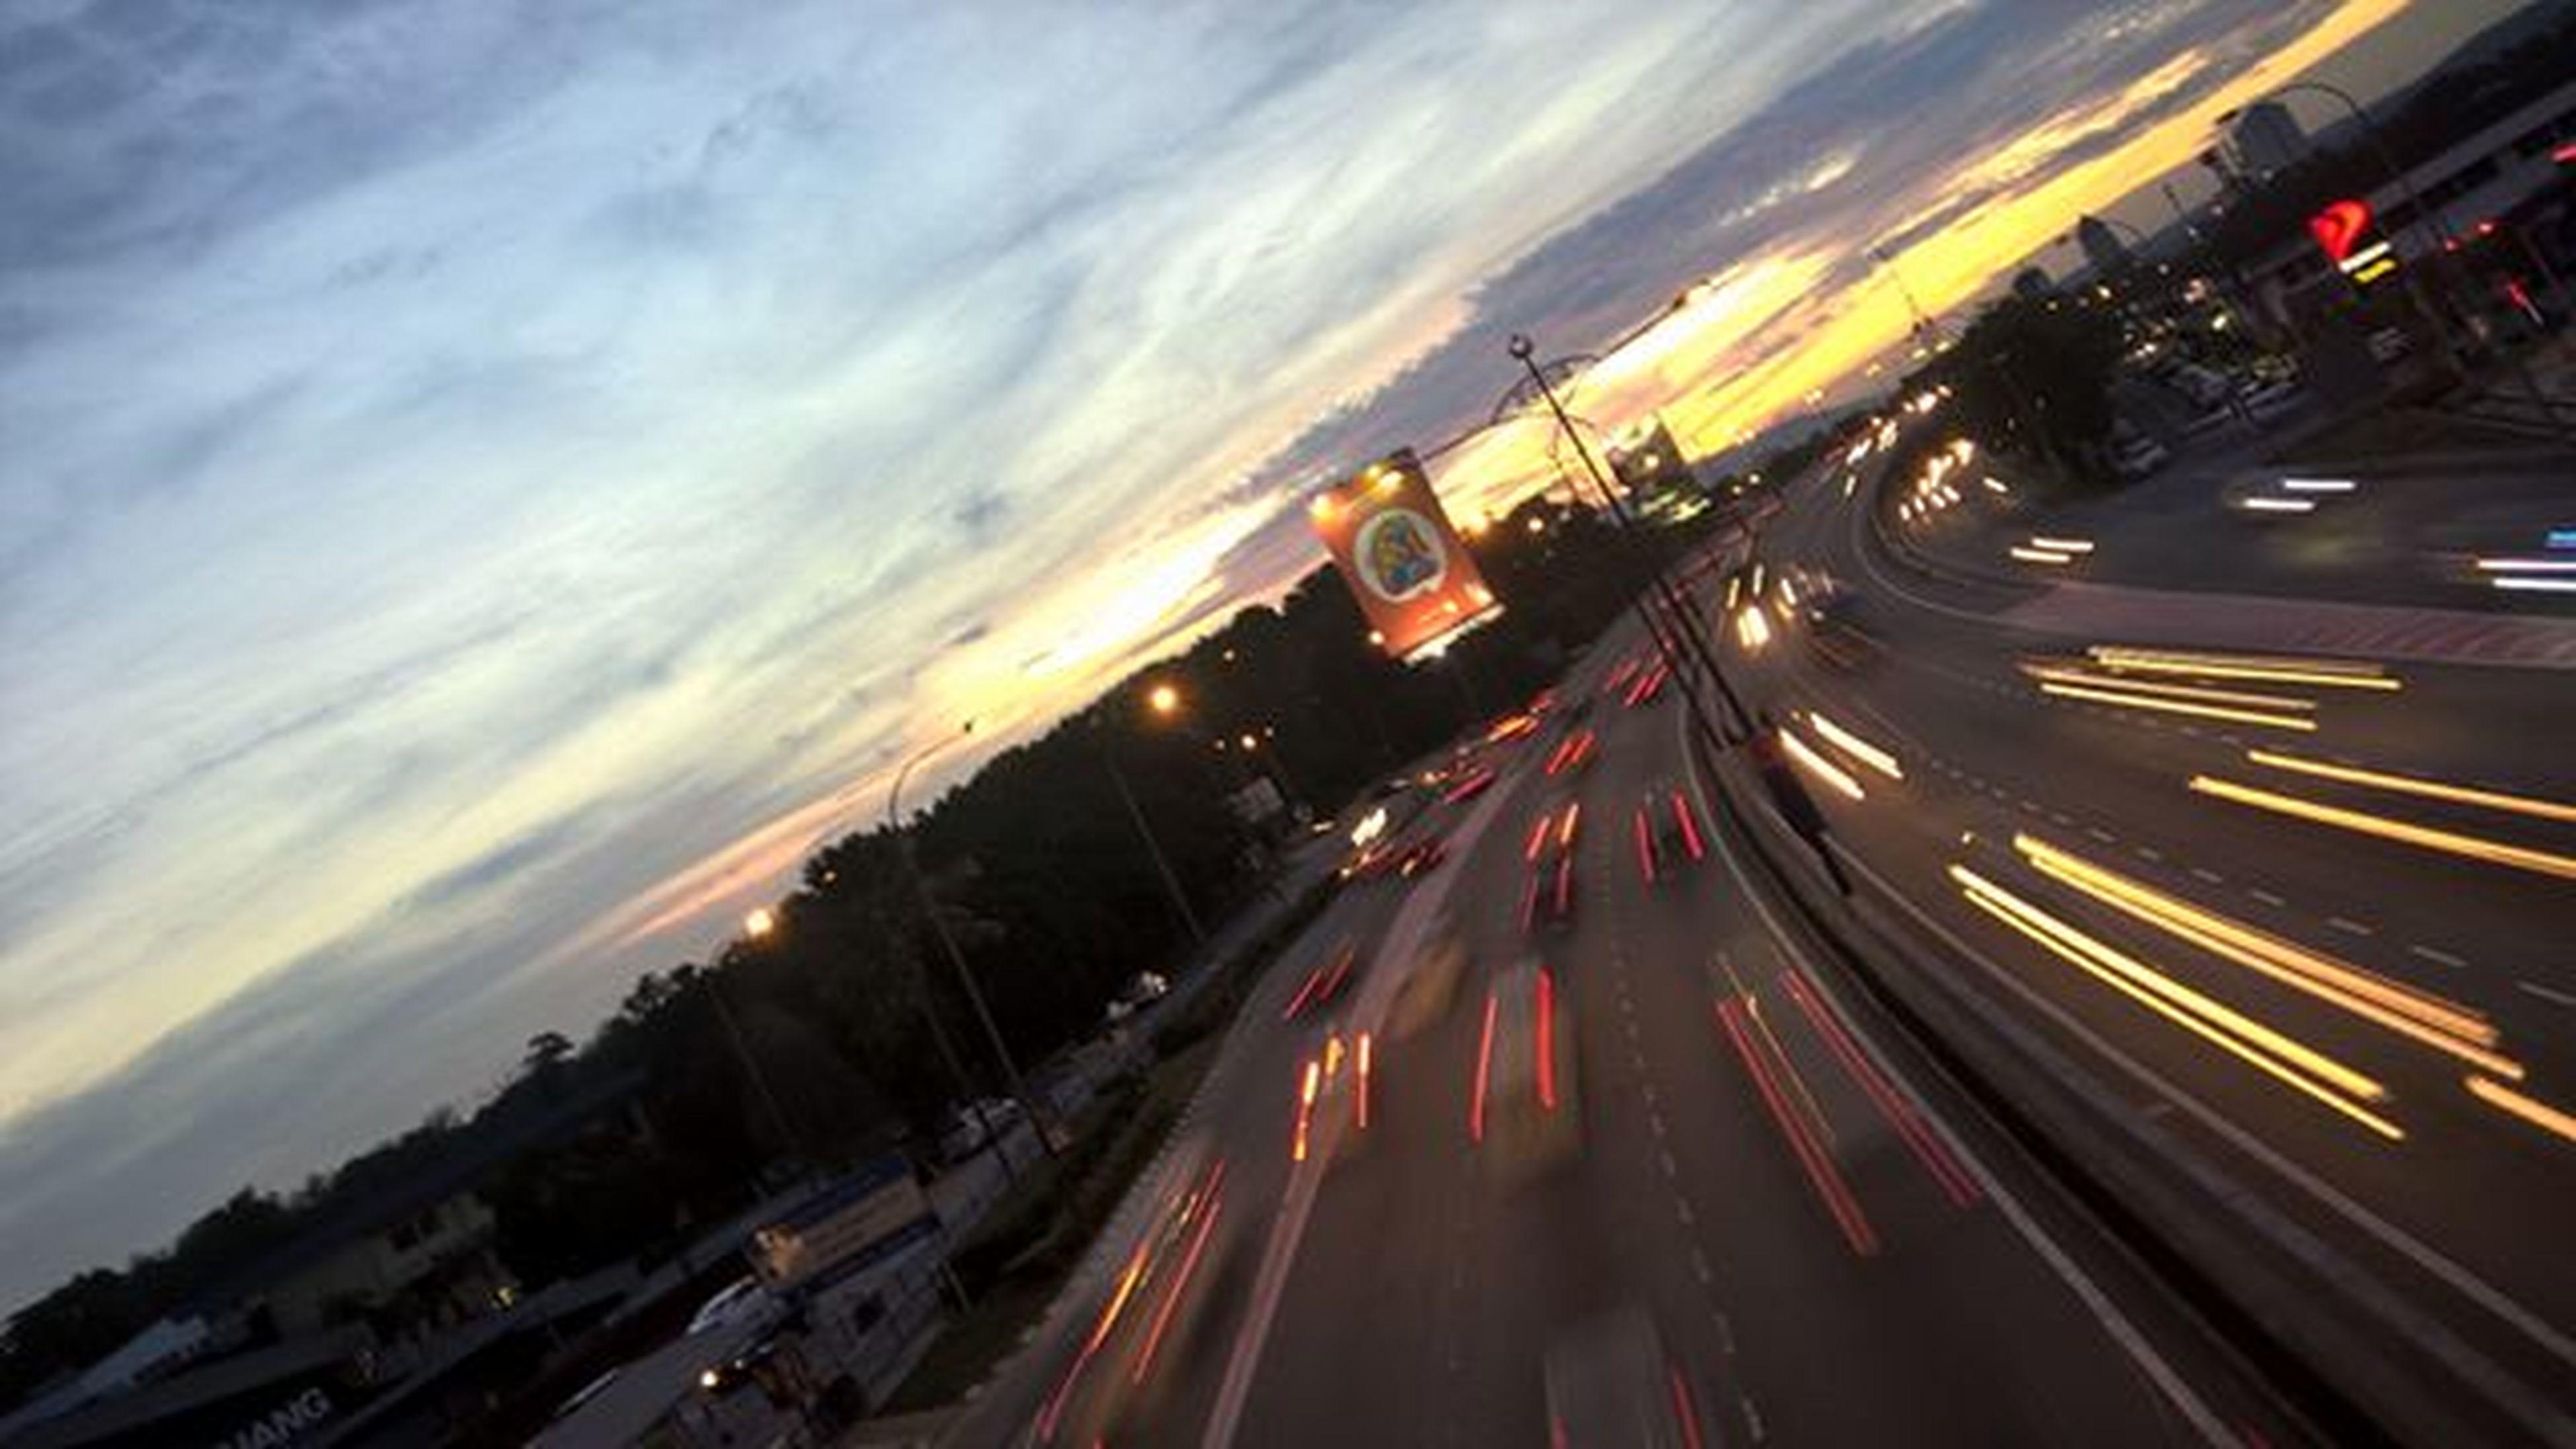 • Light Tail • Lumia830 Mobilephotography Lumiaphotography Nban ShotOnMyLumia  Editbylumiacreativestudio Longexposure Lighttrails Windowphonephotography Cities At Night